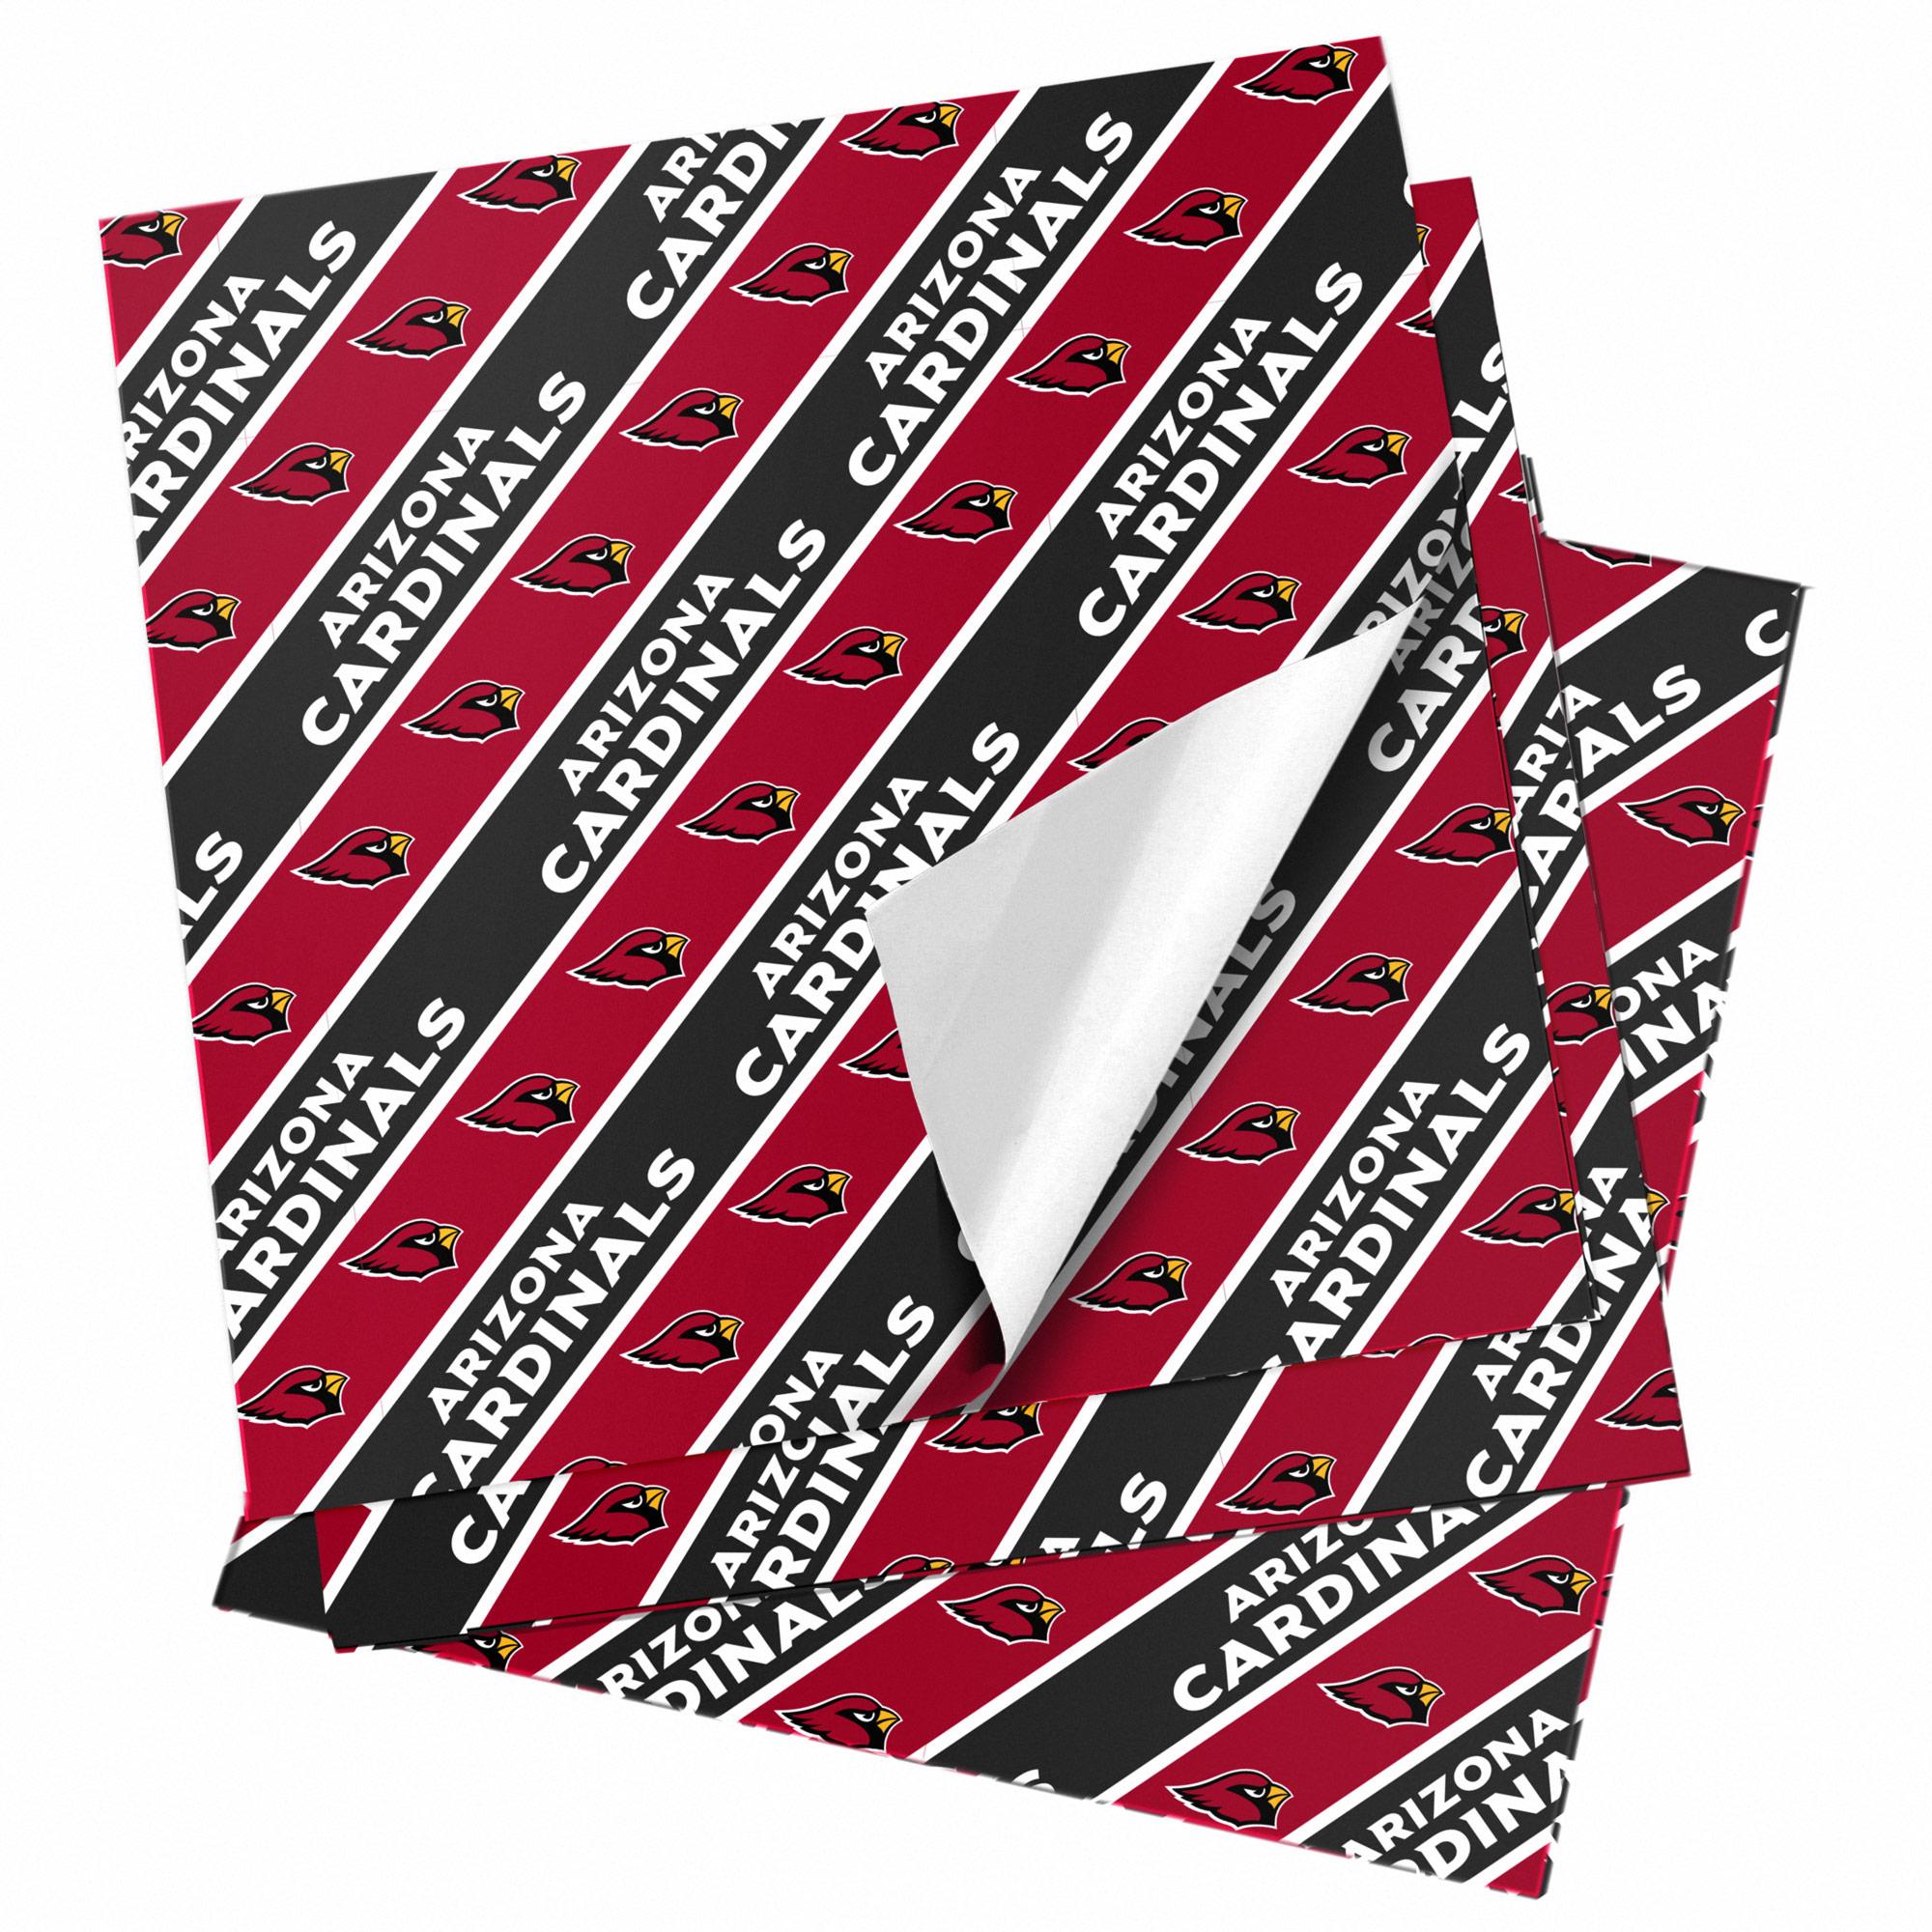 "Arizona Cardinals 20"" x 30"" Wrapping Paper"